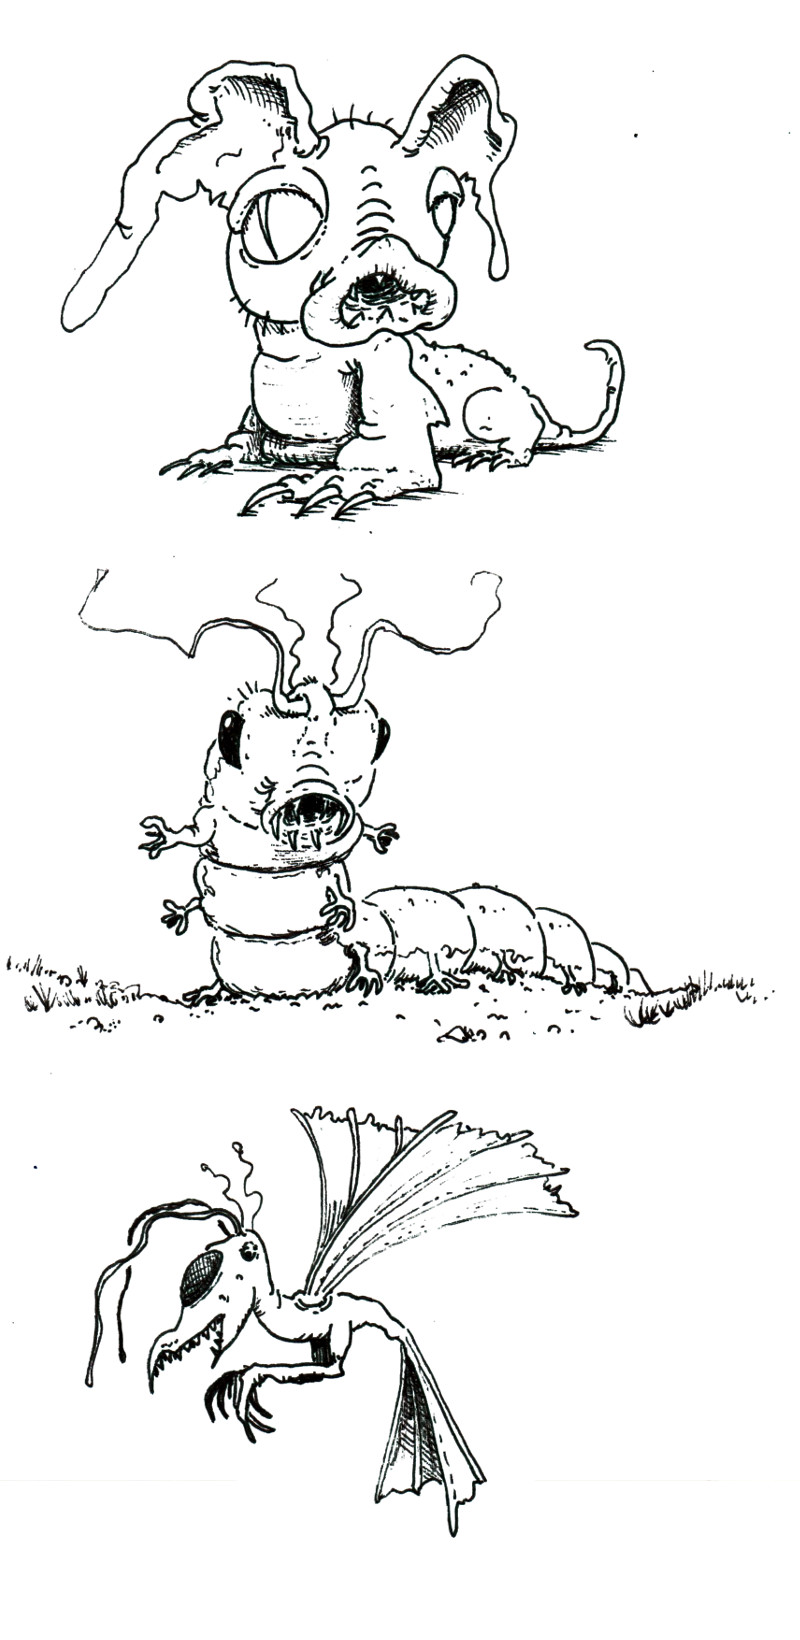 dessin de stefrex - Page 3 328640creatures302net